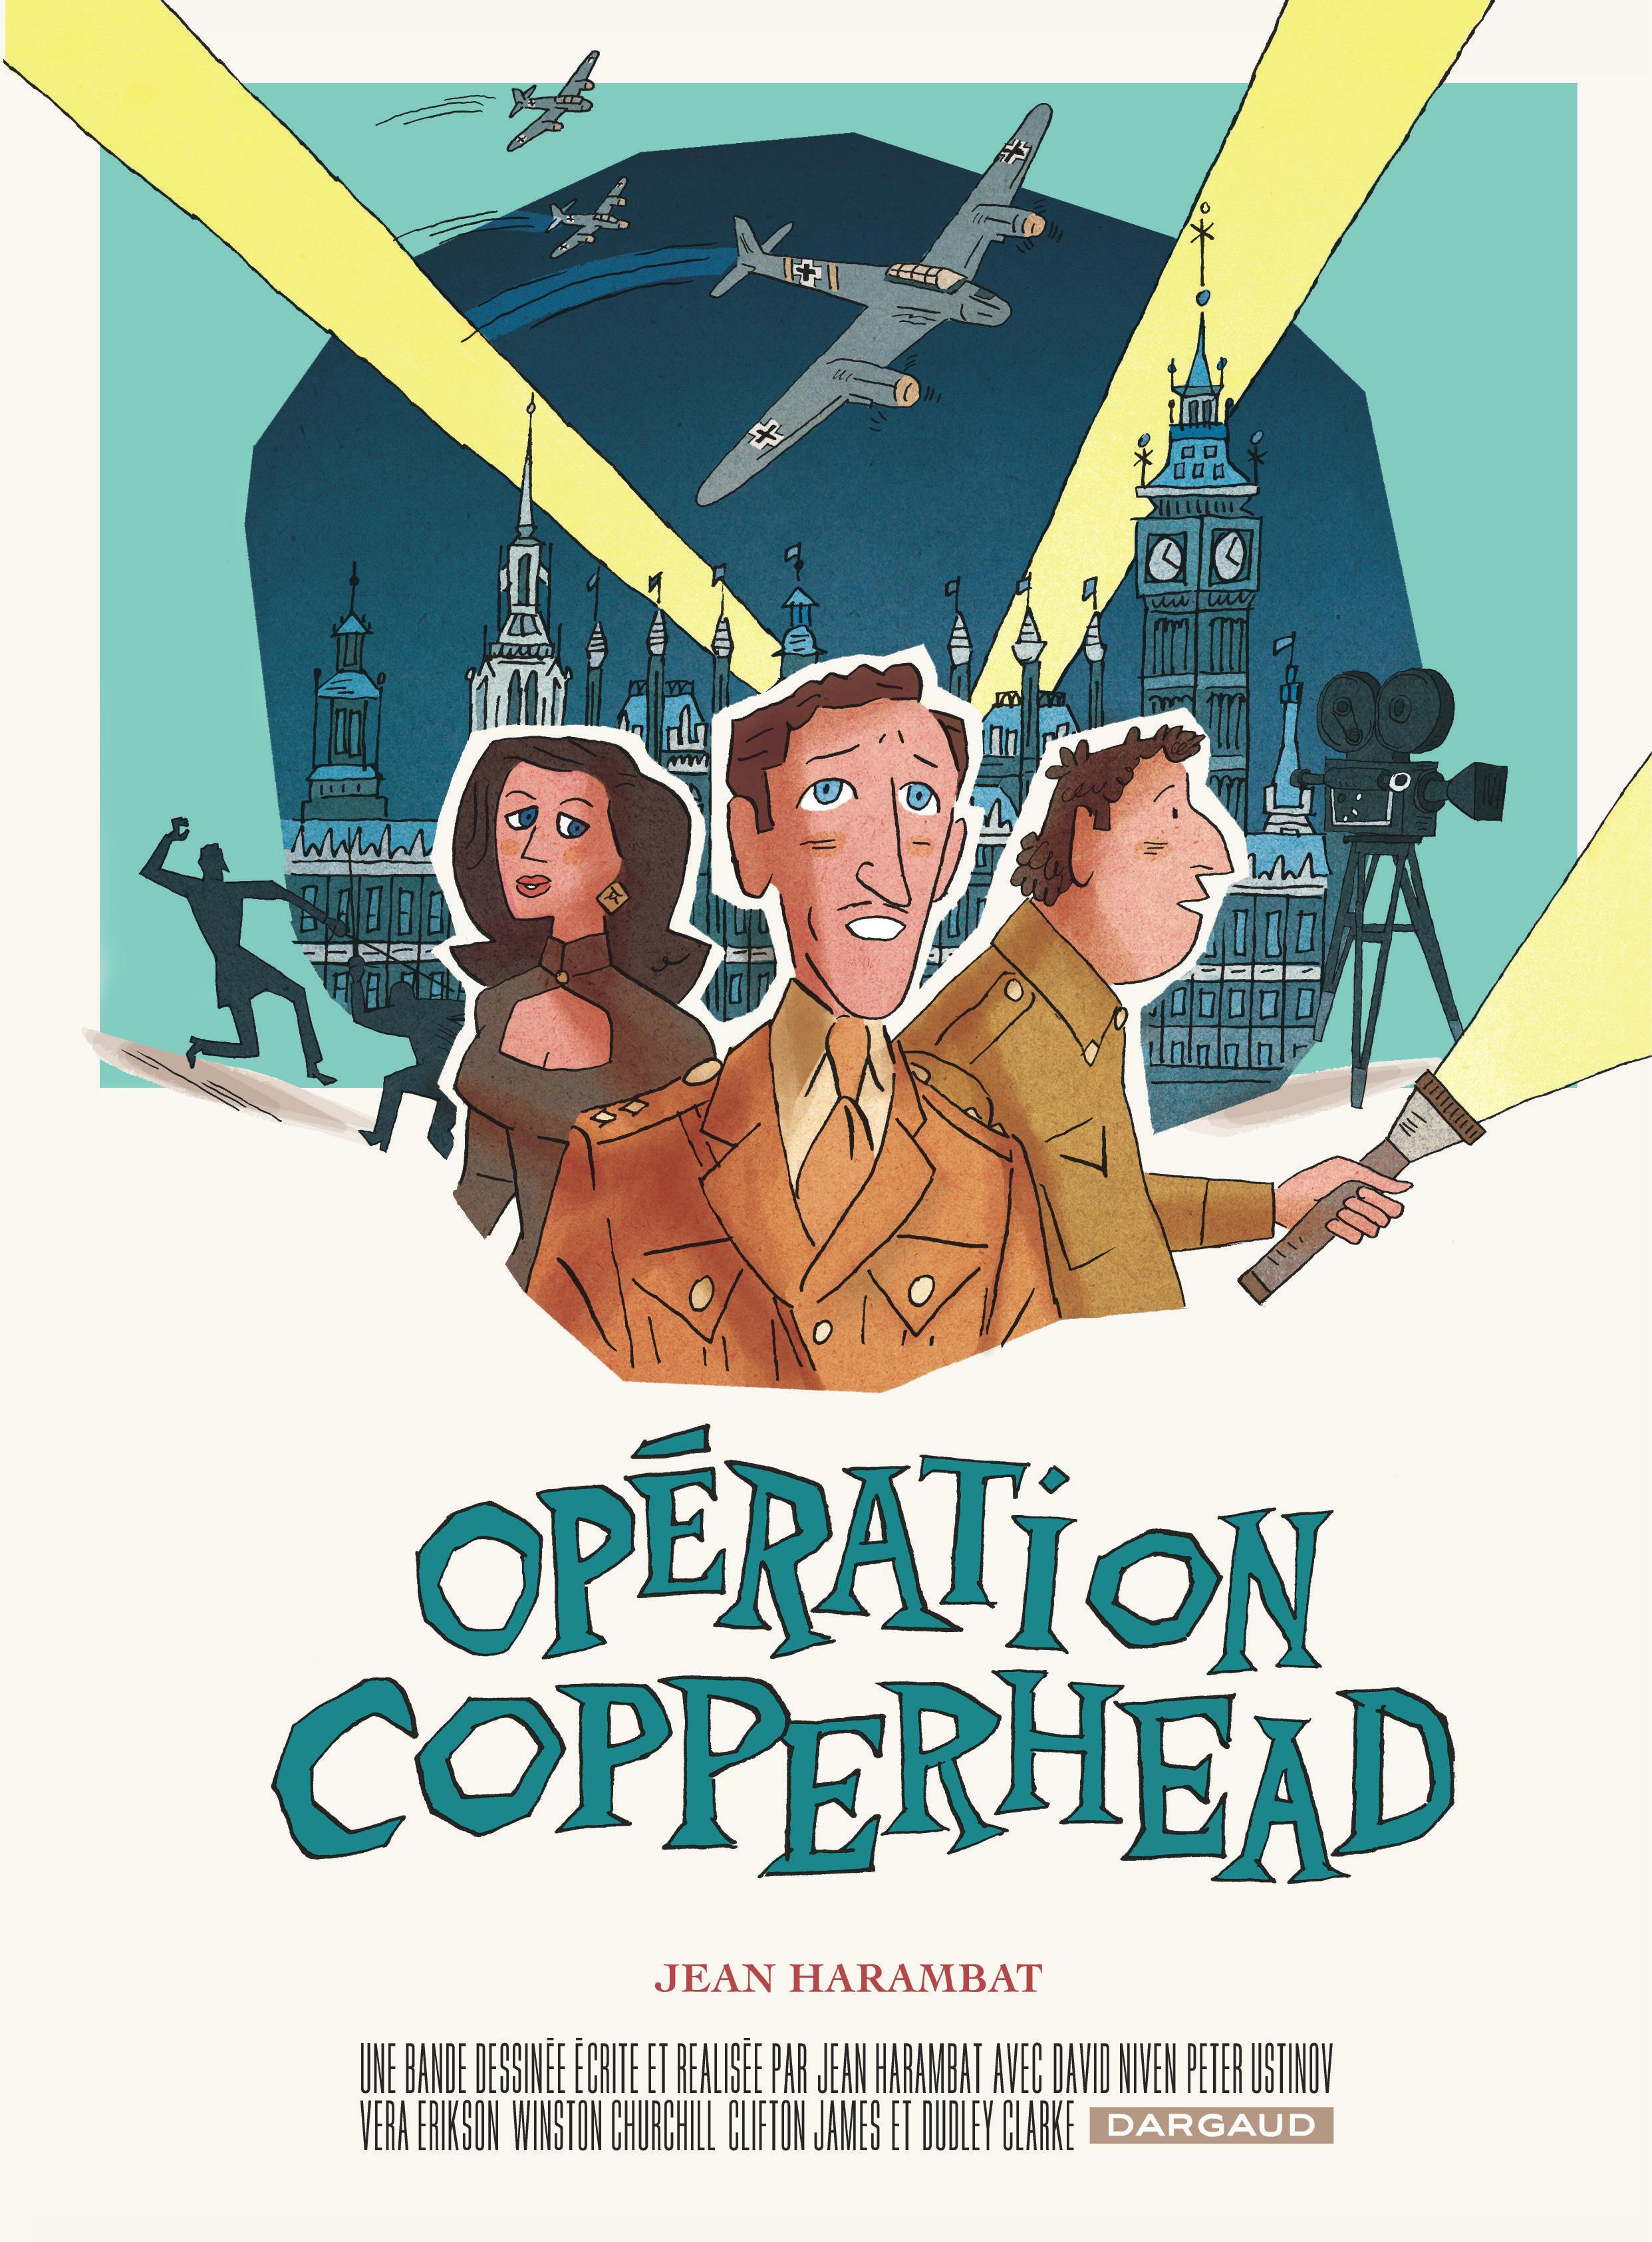 OPERATION COPPERHEAD OPERATION COPPERHEAD